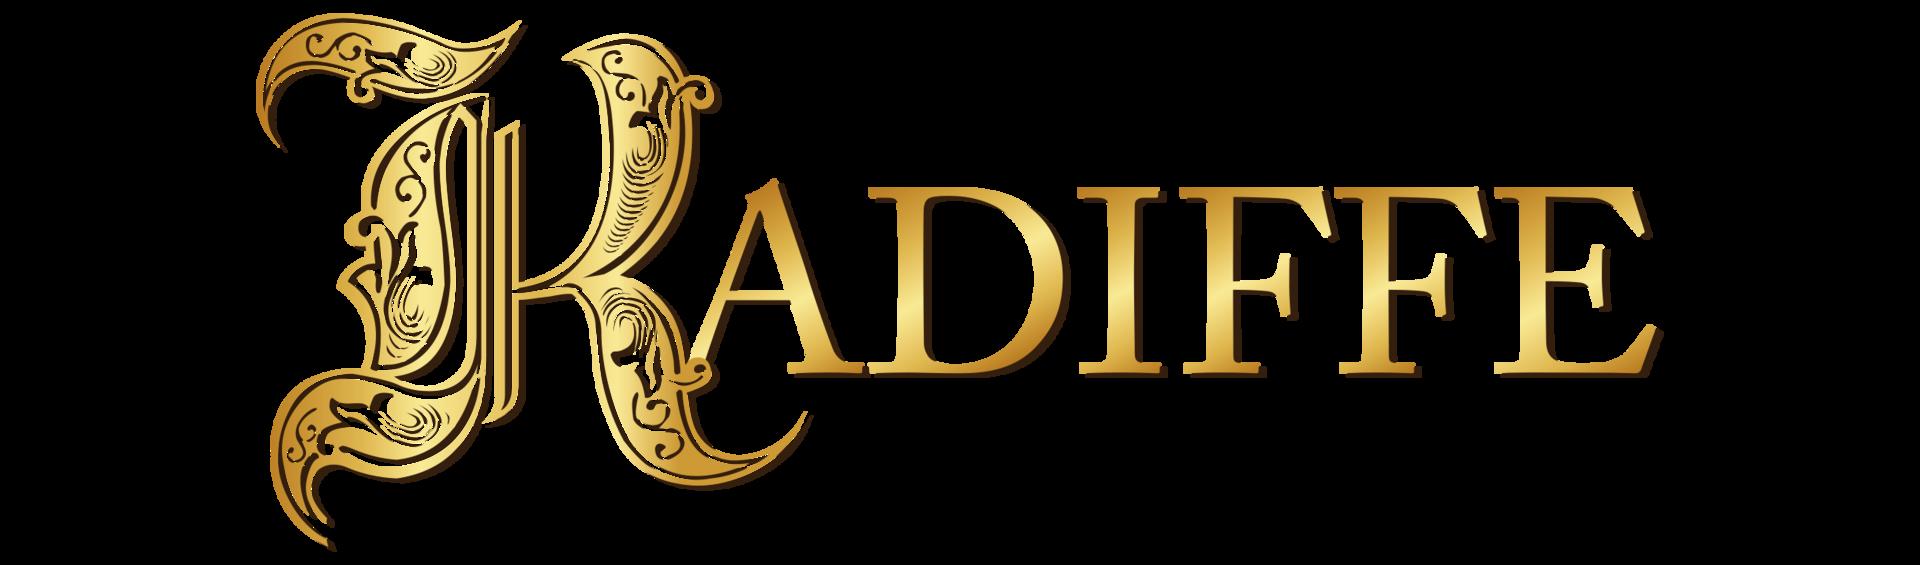 kadiffe